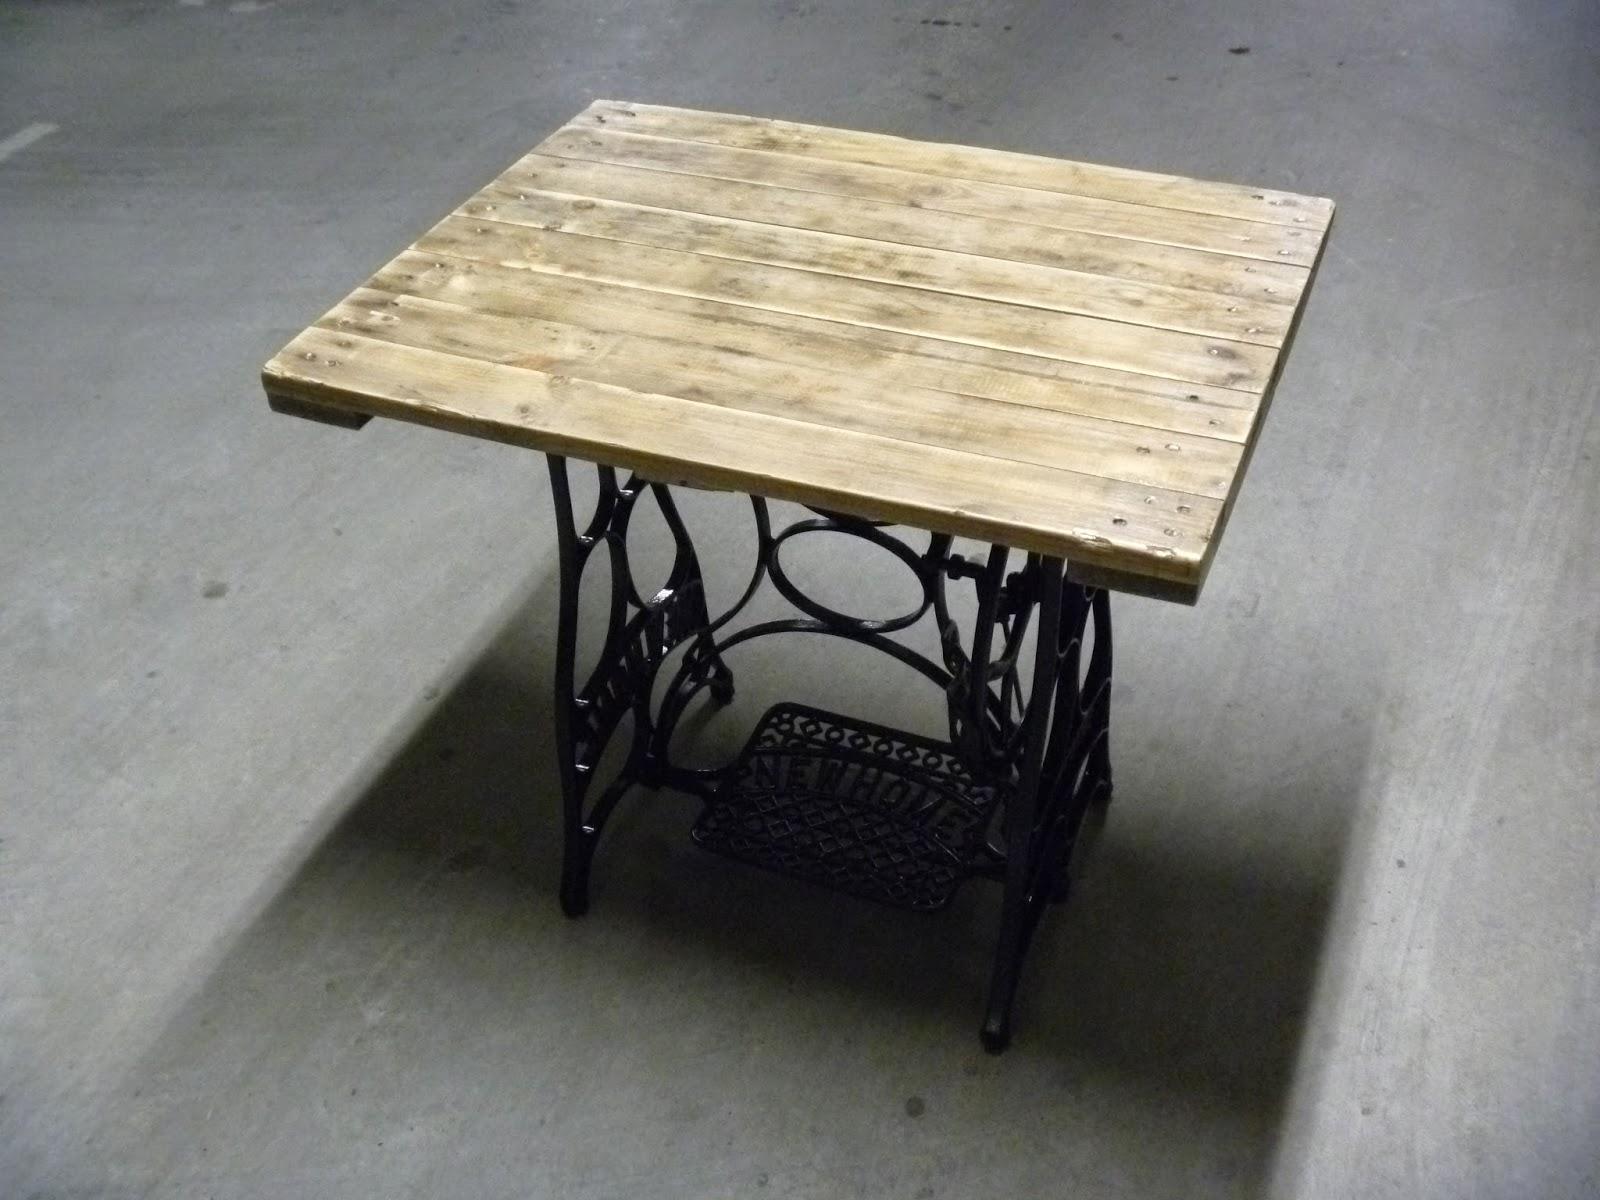 la menuiserie 503 table de bar r cup new home. Black Bedroom Furniture Sets. Home Design Ideas